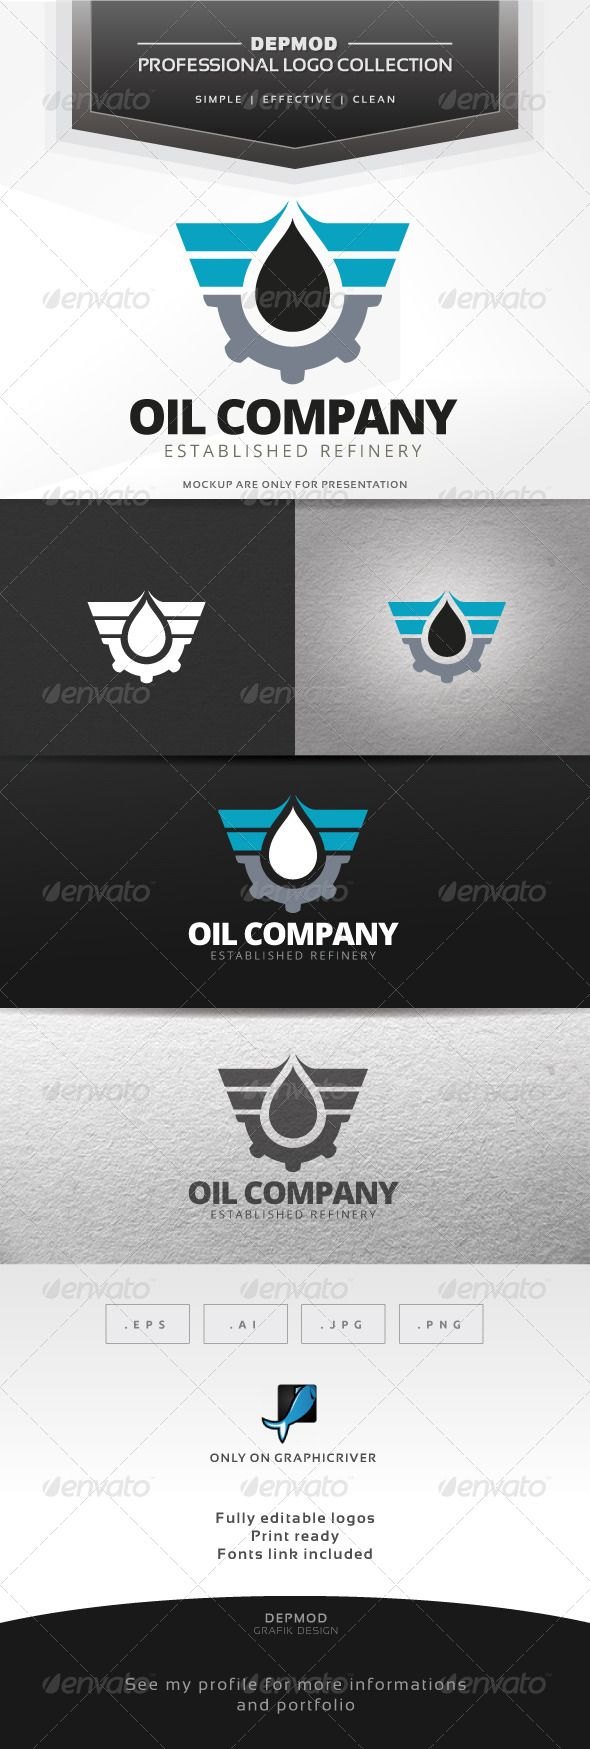 Oil Company - Logo Design Template Vector #logotype Download it here: http://graphicriver.net/item/oil-company-logo/7695472?s_rank=878?ref=nexion